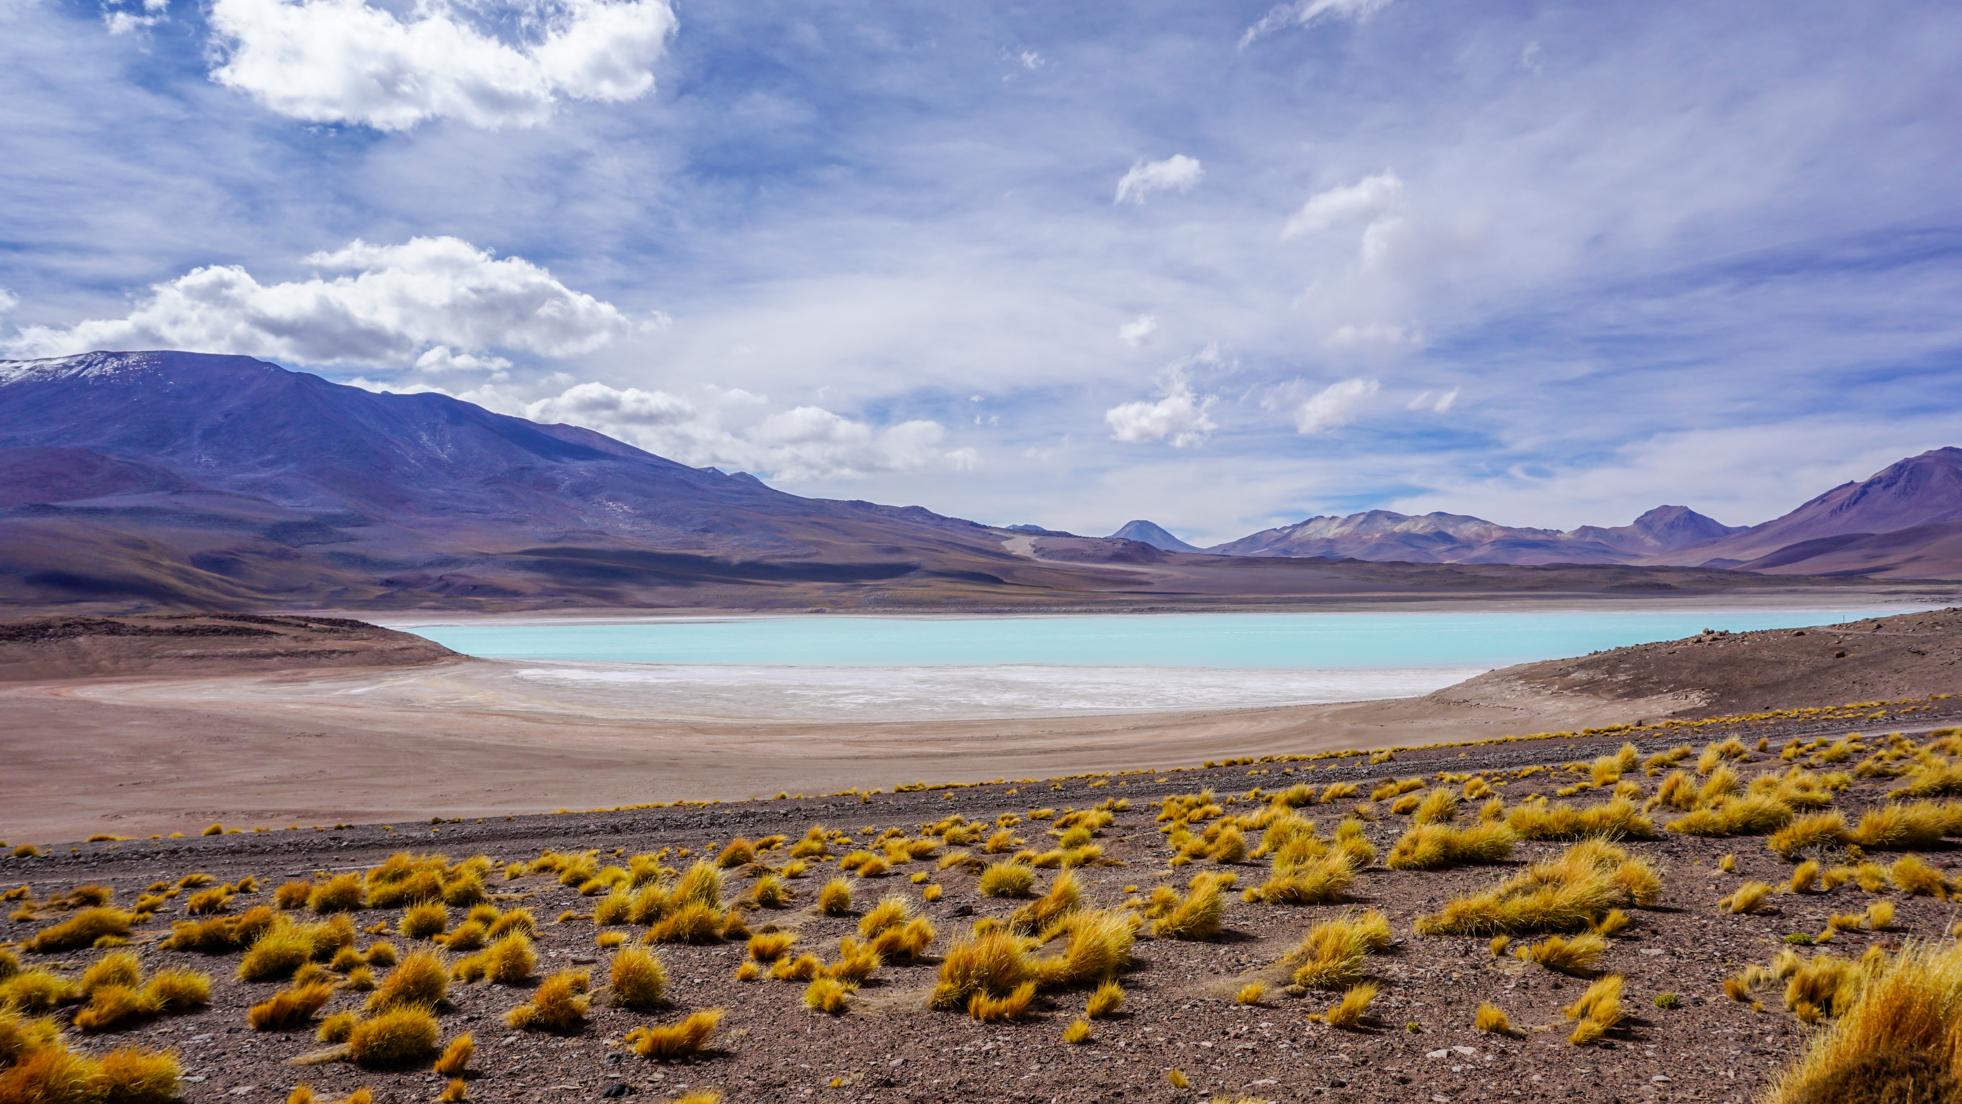 Boliwia piękna i sroga – Eduardo Avaroa National Reserve